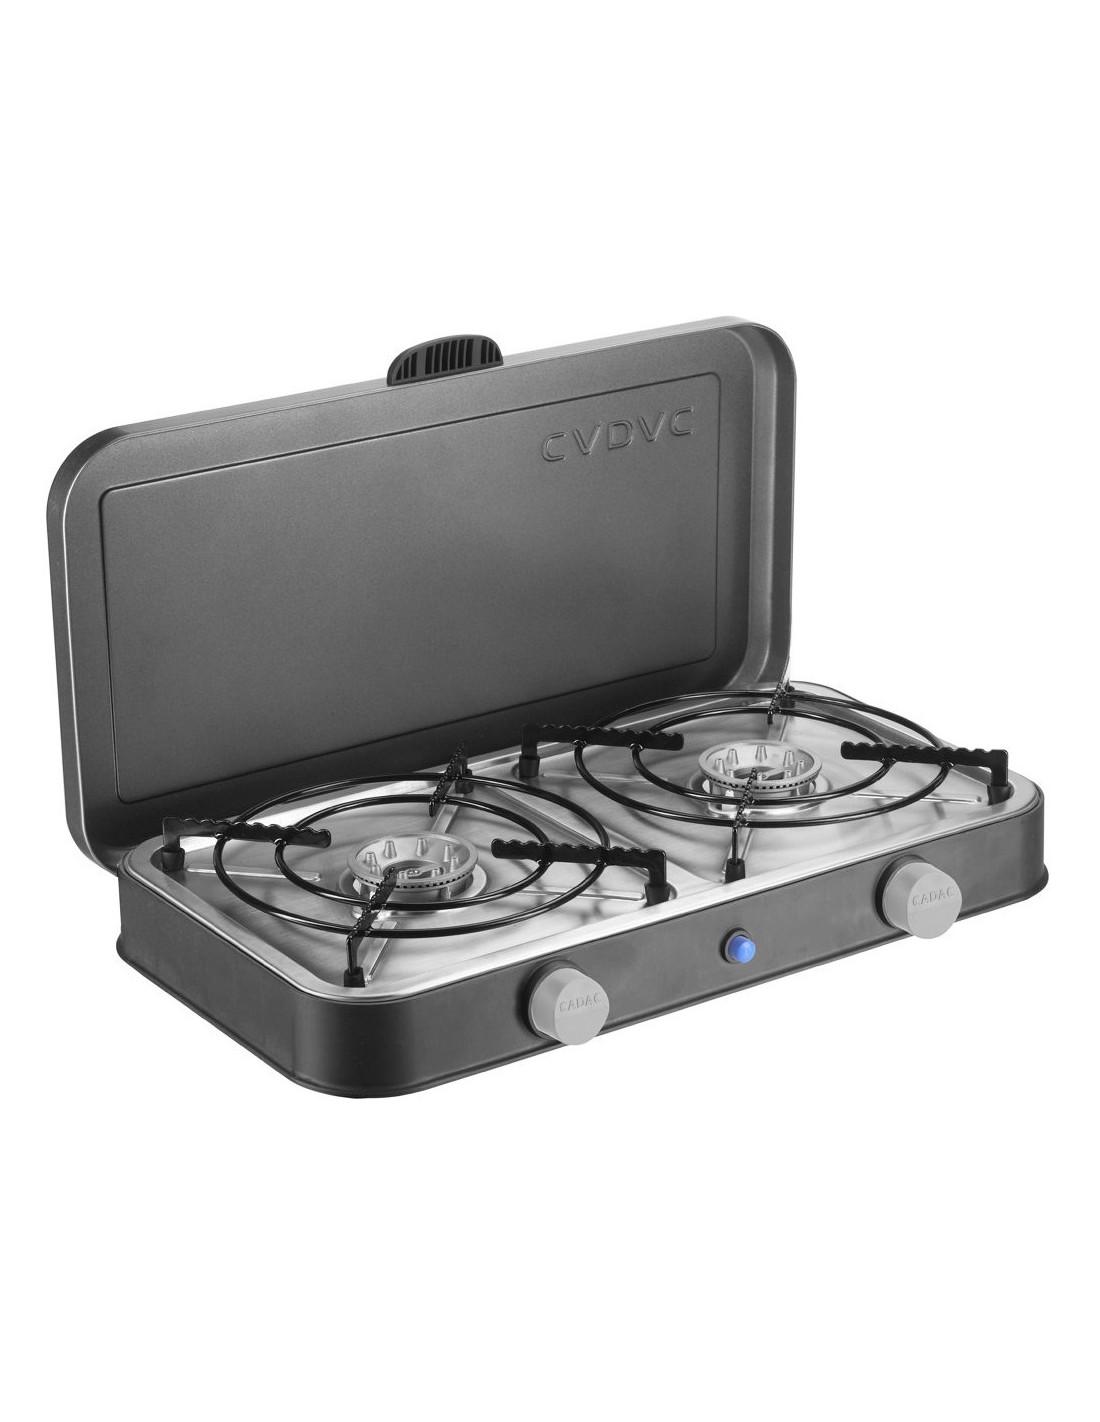 Cocina hornillo y plancha cadac 2 cook deluxe tienda de for Cocina de gas profesional